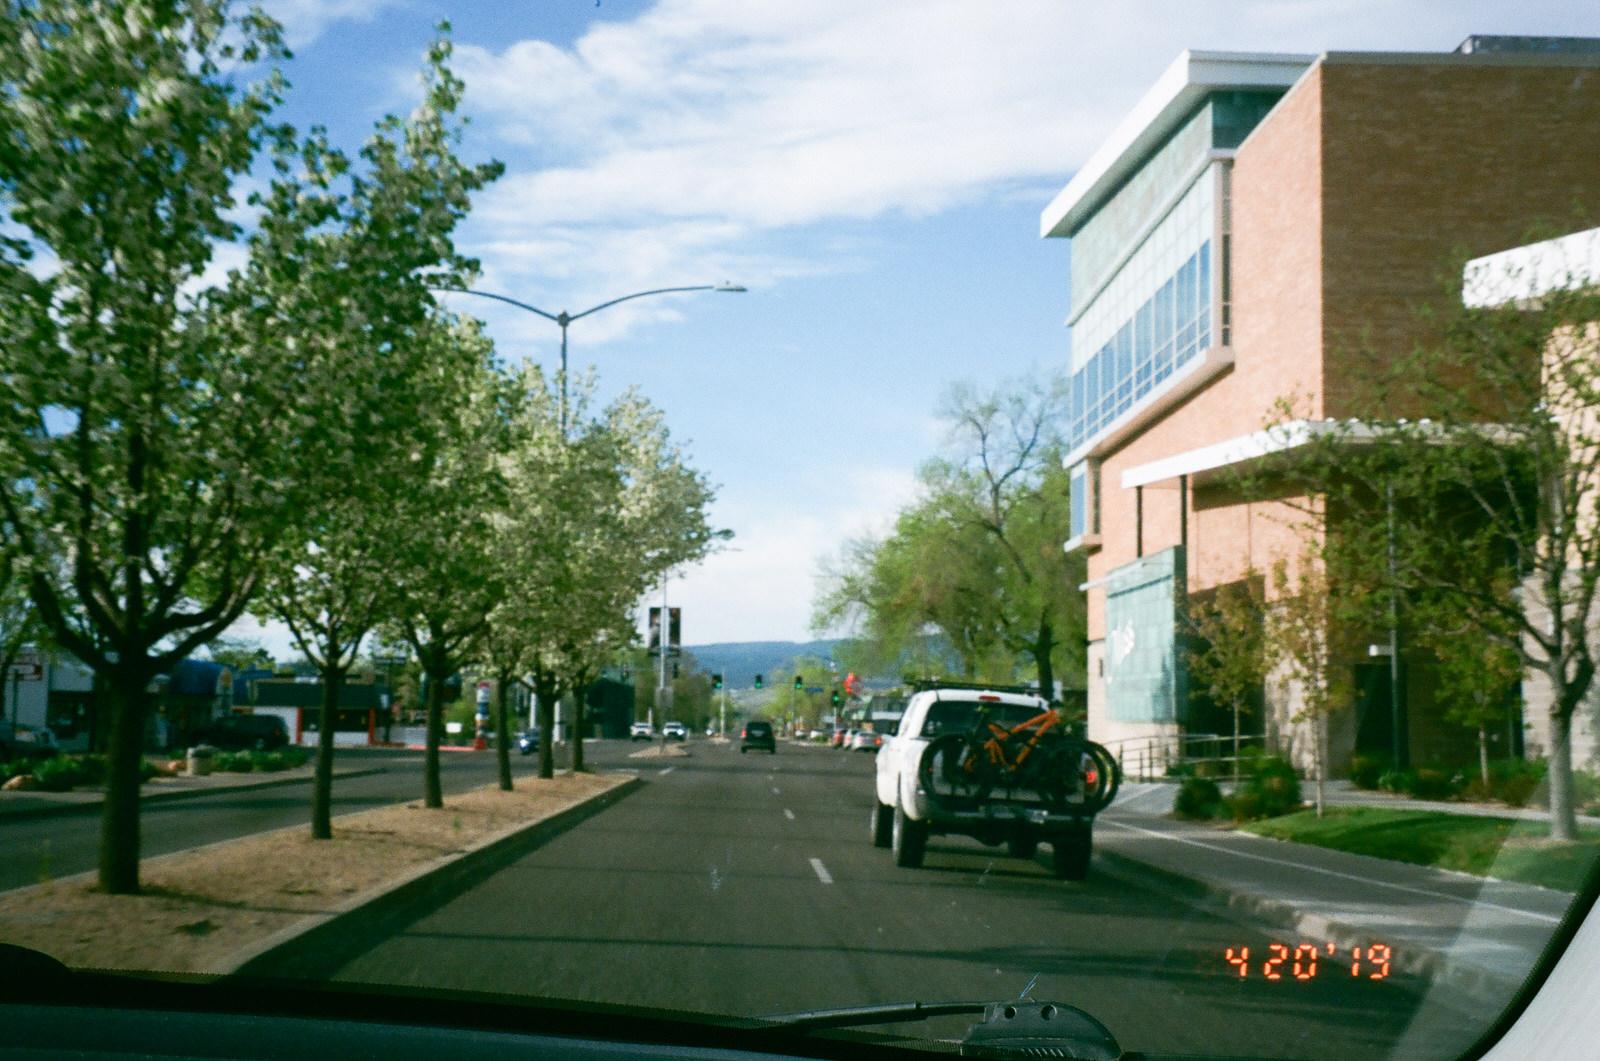 Streets of GJ